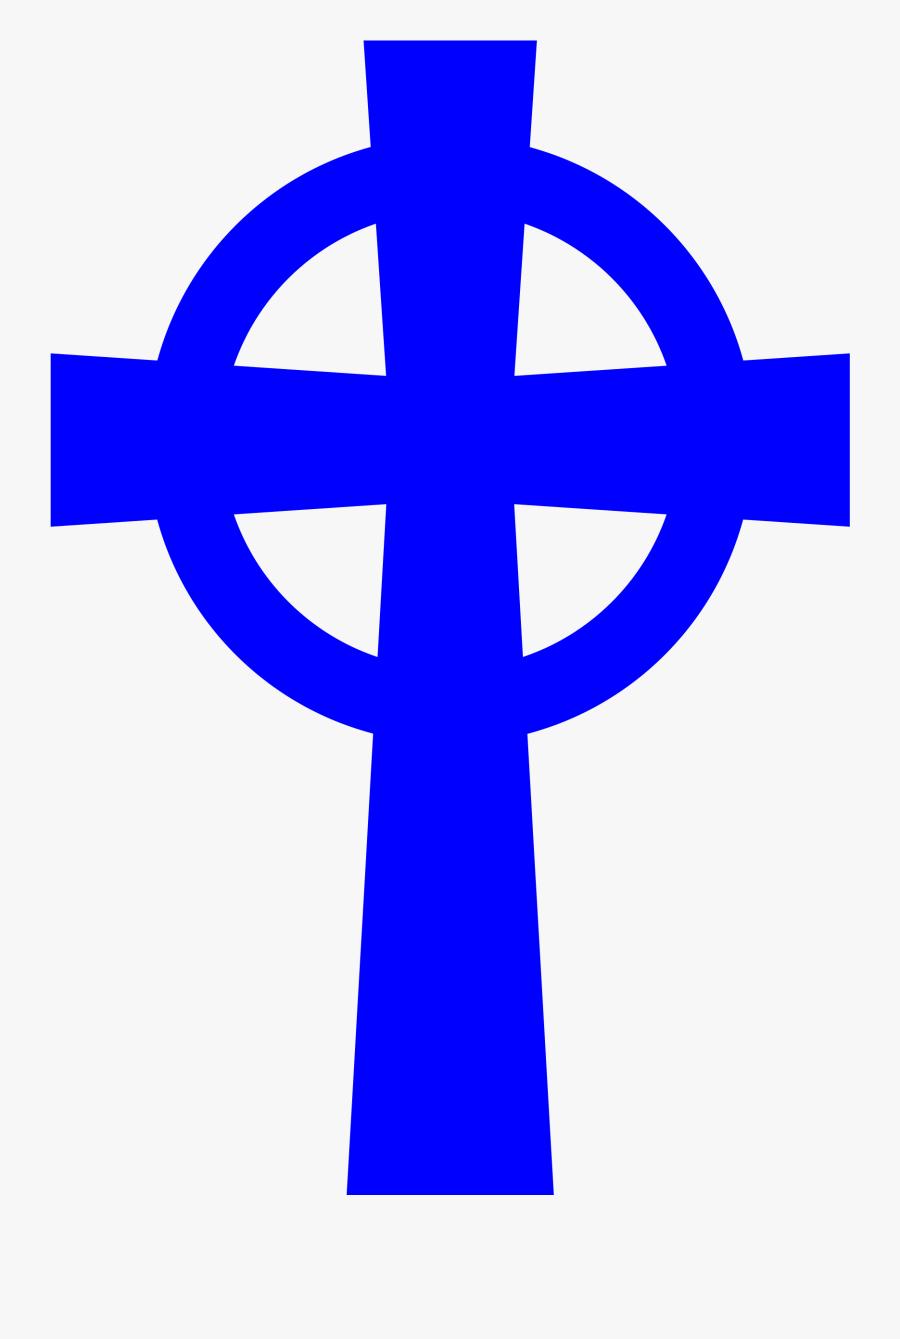 Va-046 Catholic Celtic Cross Clip Free Download - Catholic Cross Png Clipart, Transparent Clipart